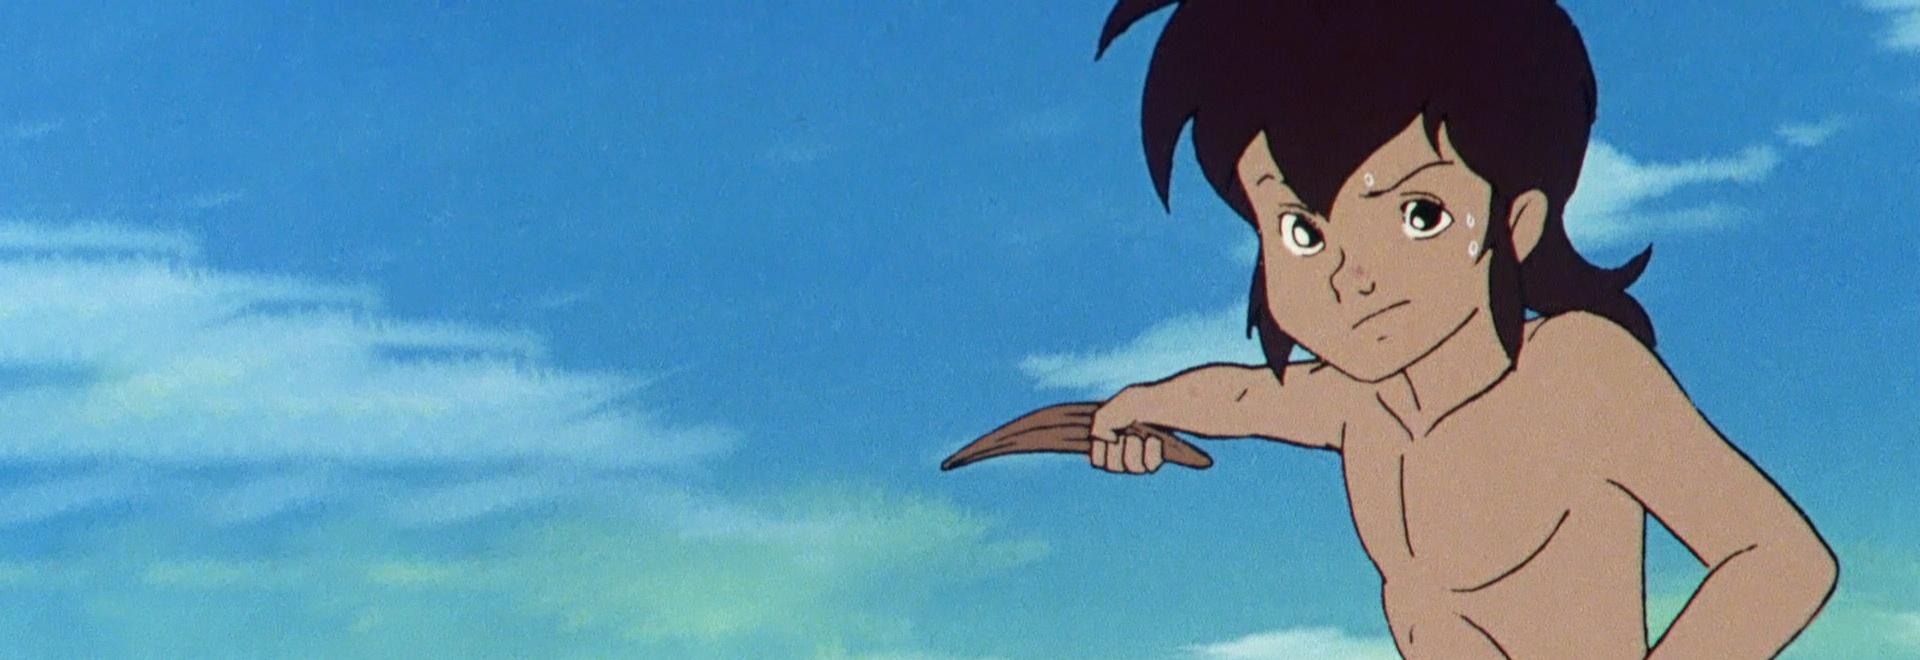 Mowgli, ragazzo lupo